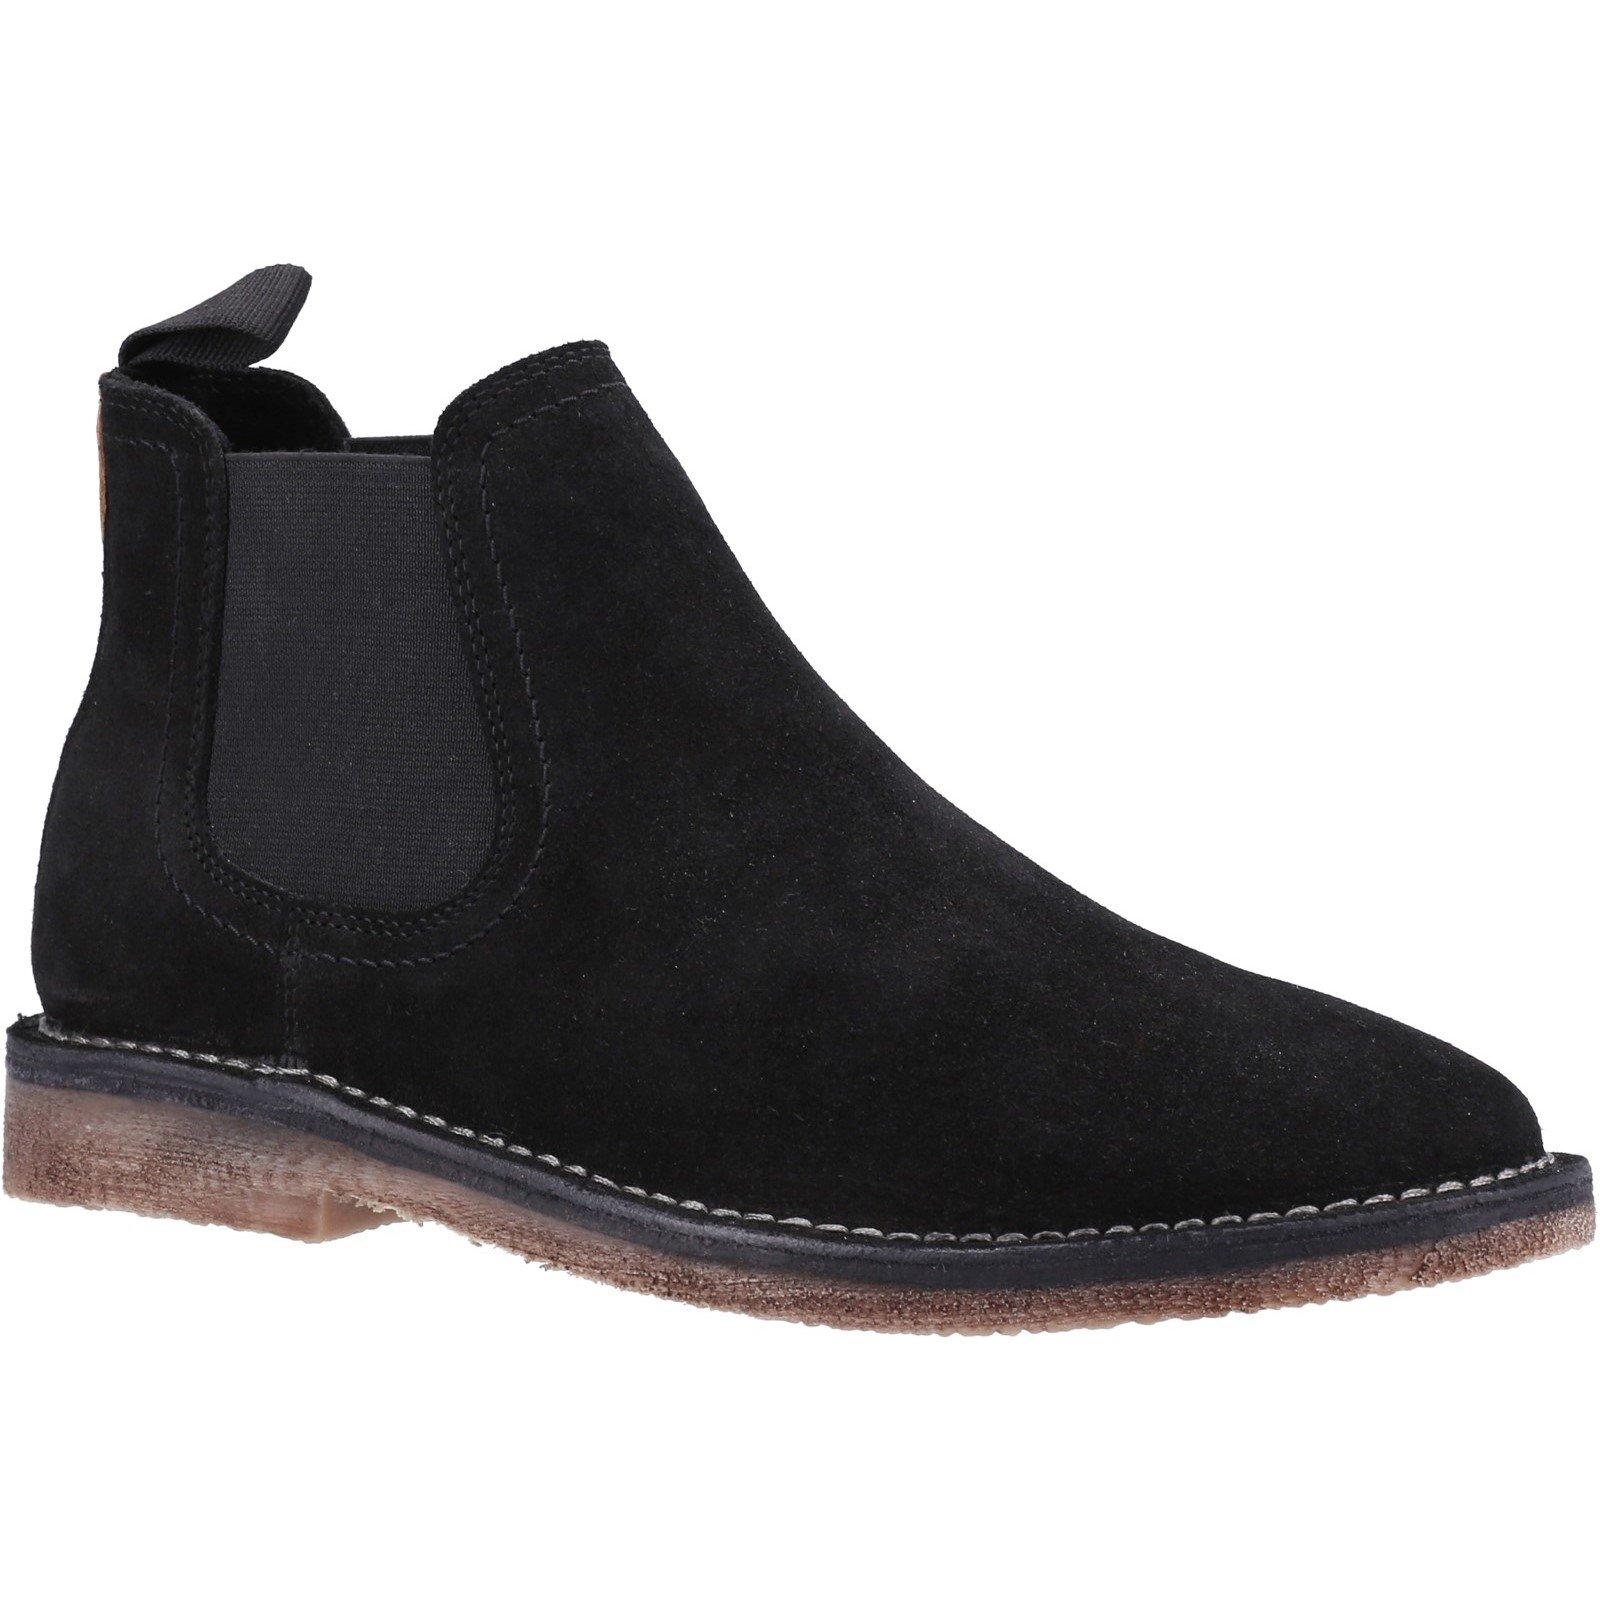 Hush Puppies Men's Shaun Leather Chelsea Boot Various Colours 32897 - Black 10